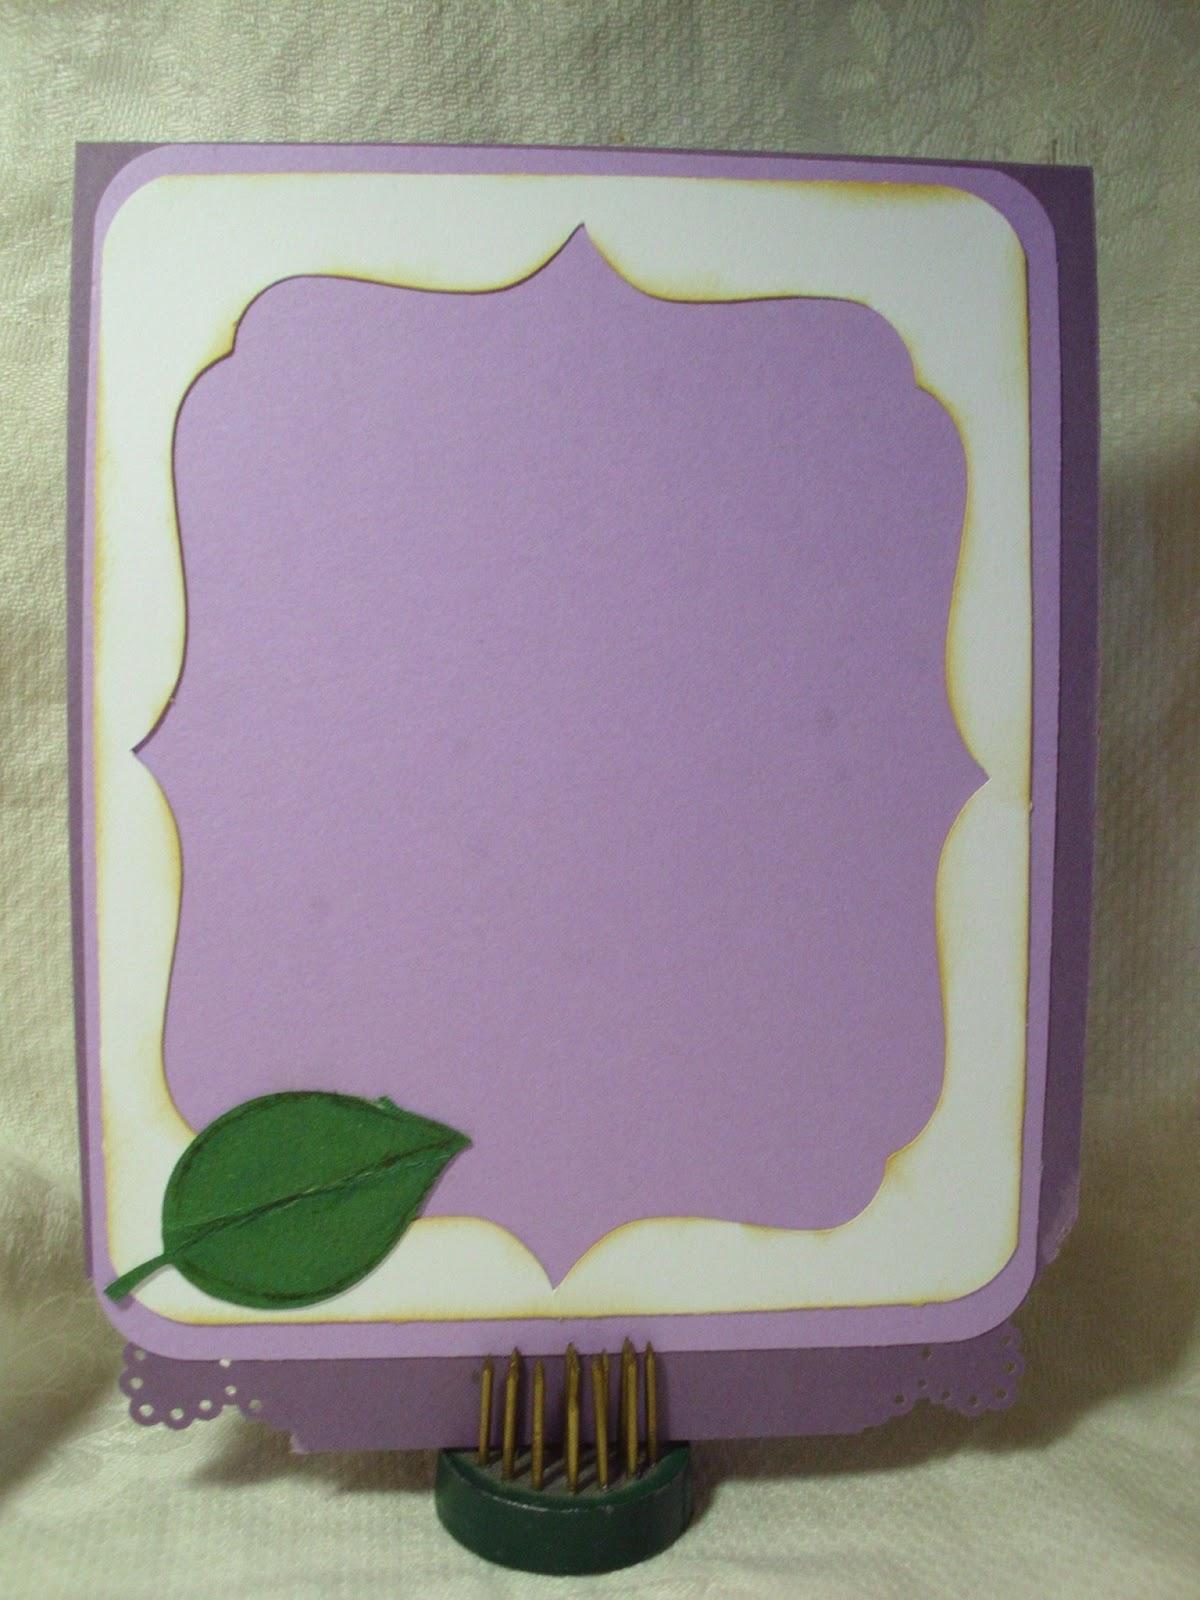 Shellys Craft Blog: My Cricut Craft Room 100 Cartridge